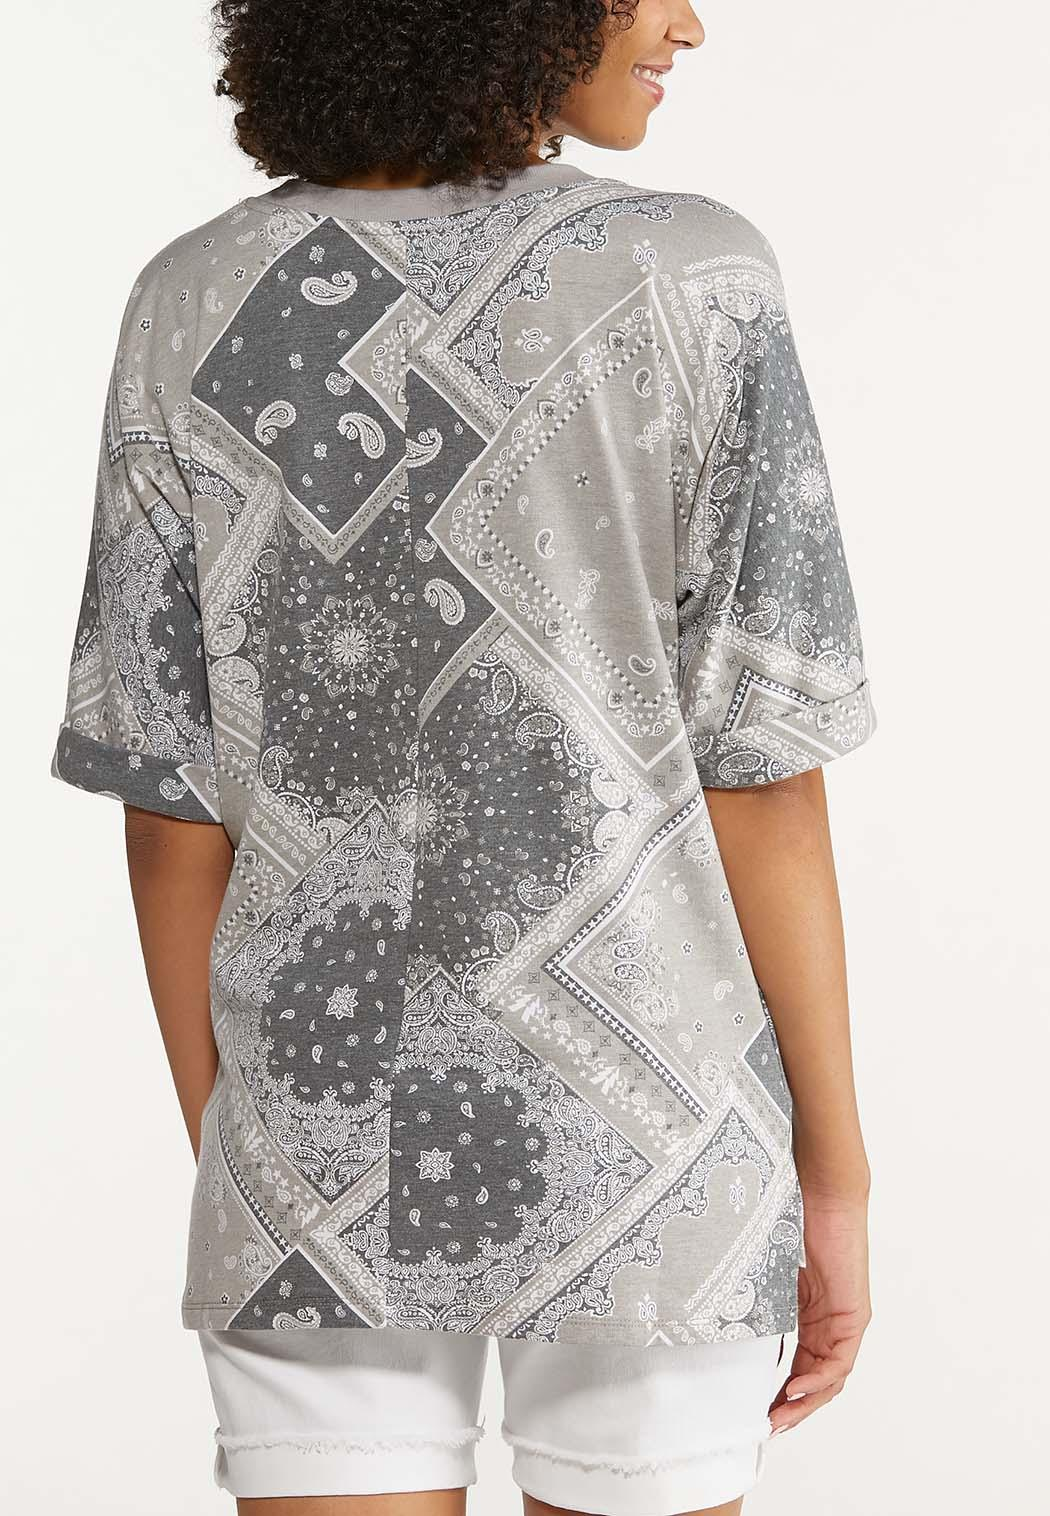 Plus Size Distressed Bandana Sweatshirt (Item #44645359)